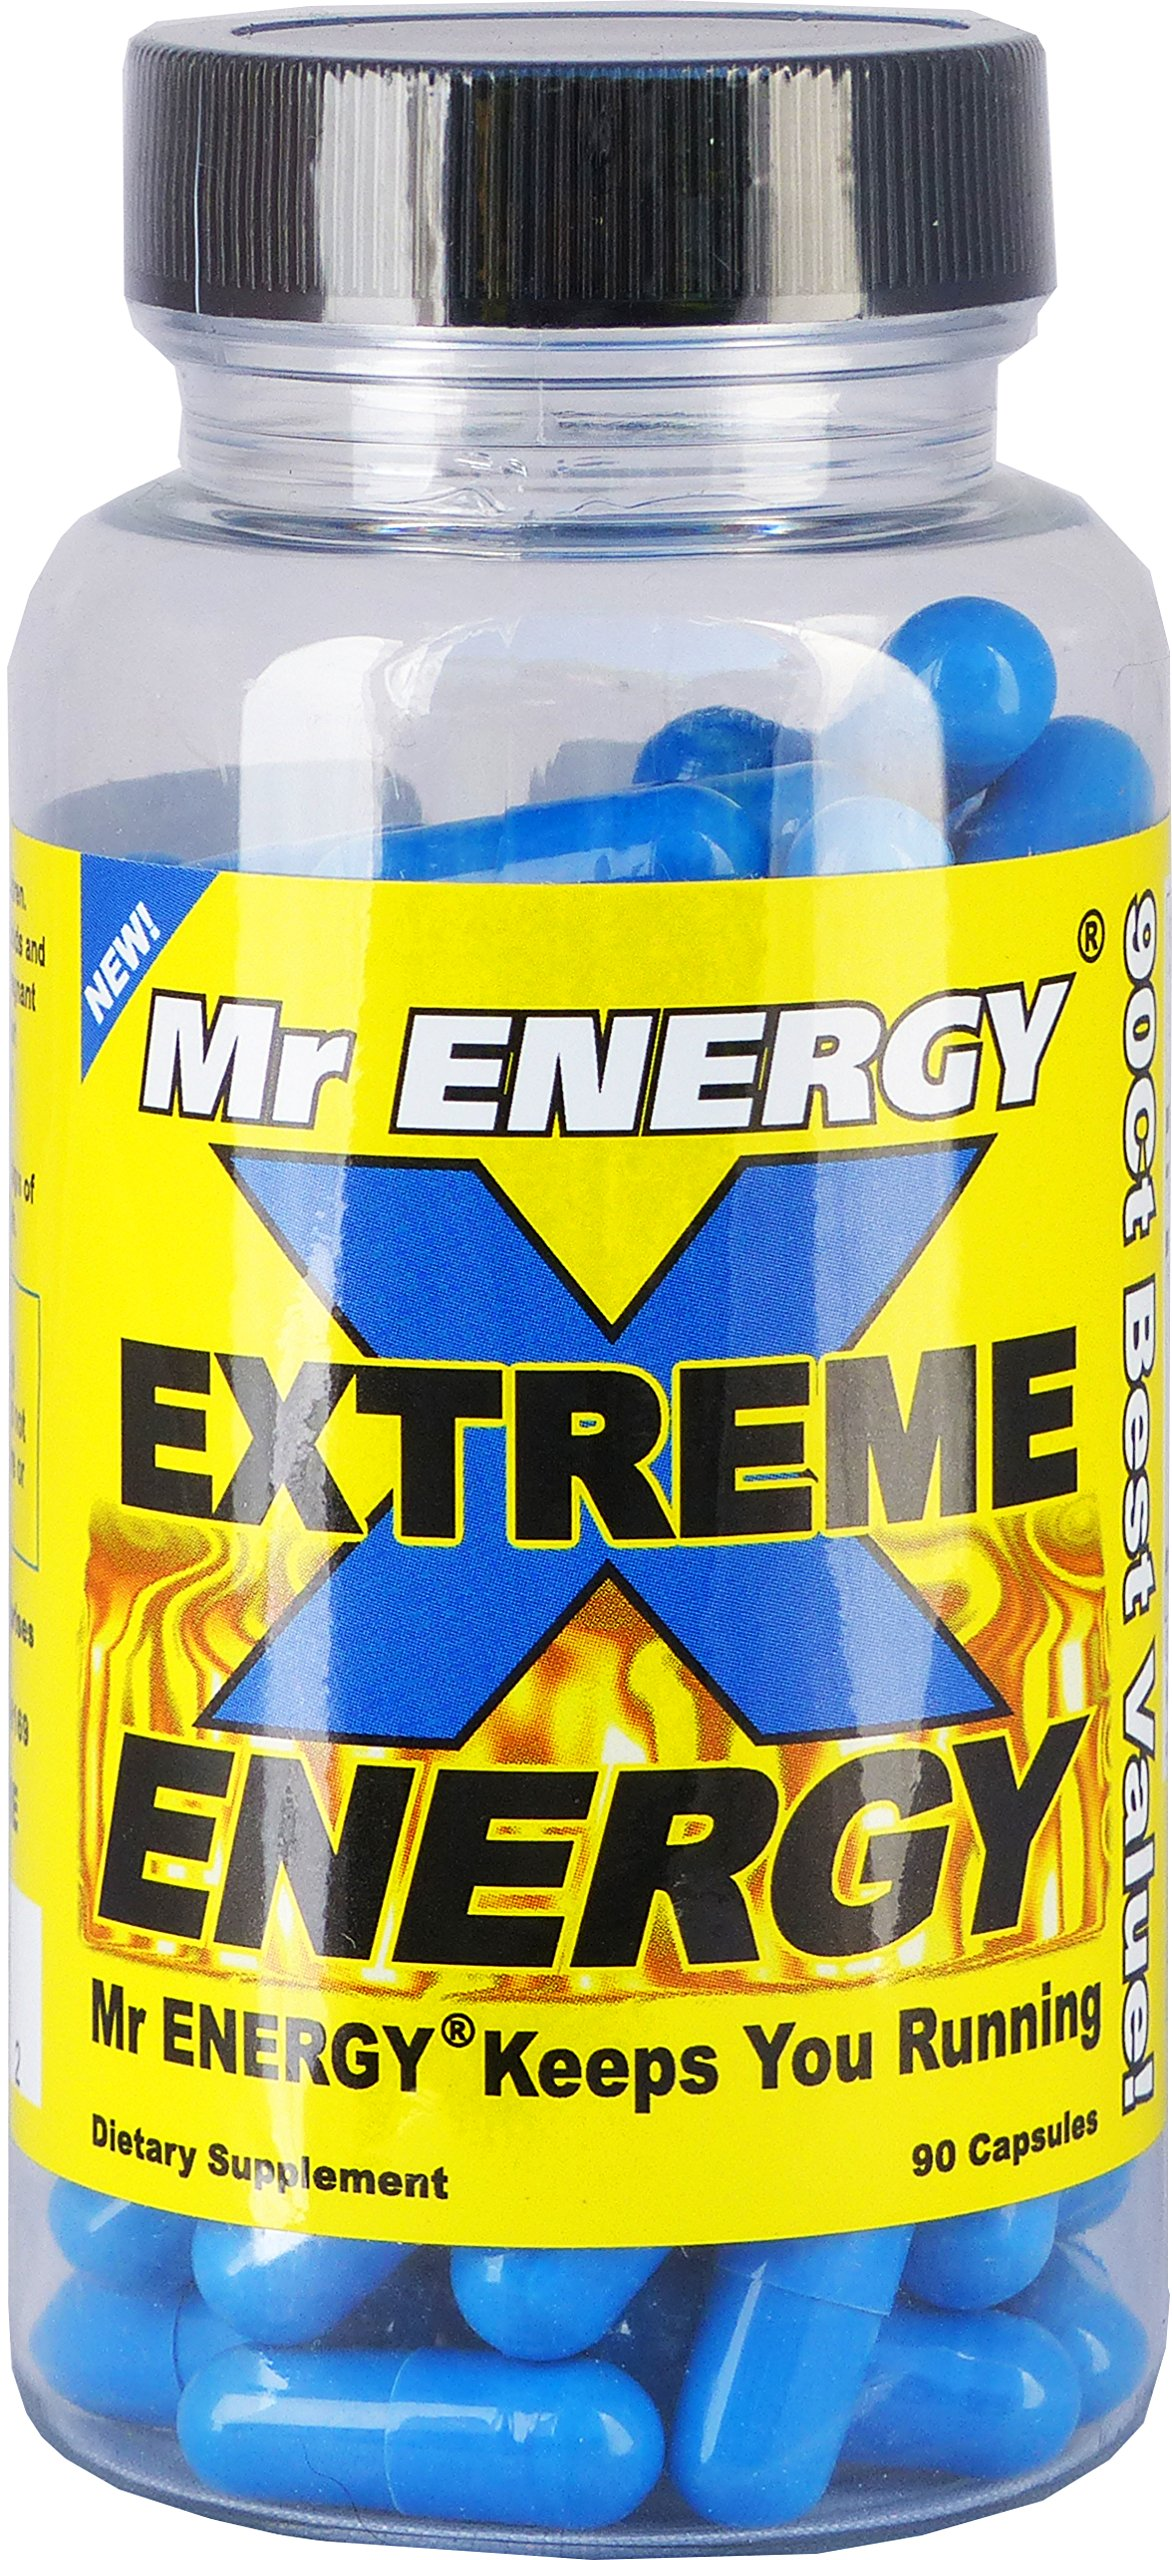 Mr ENERGY EXTREME ENERGY Pills 90 Capsules